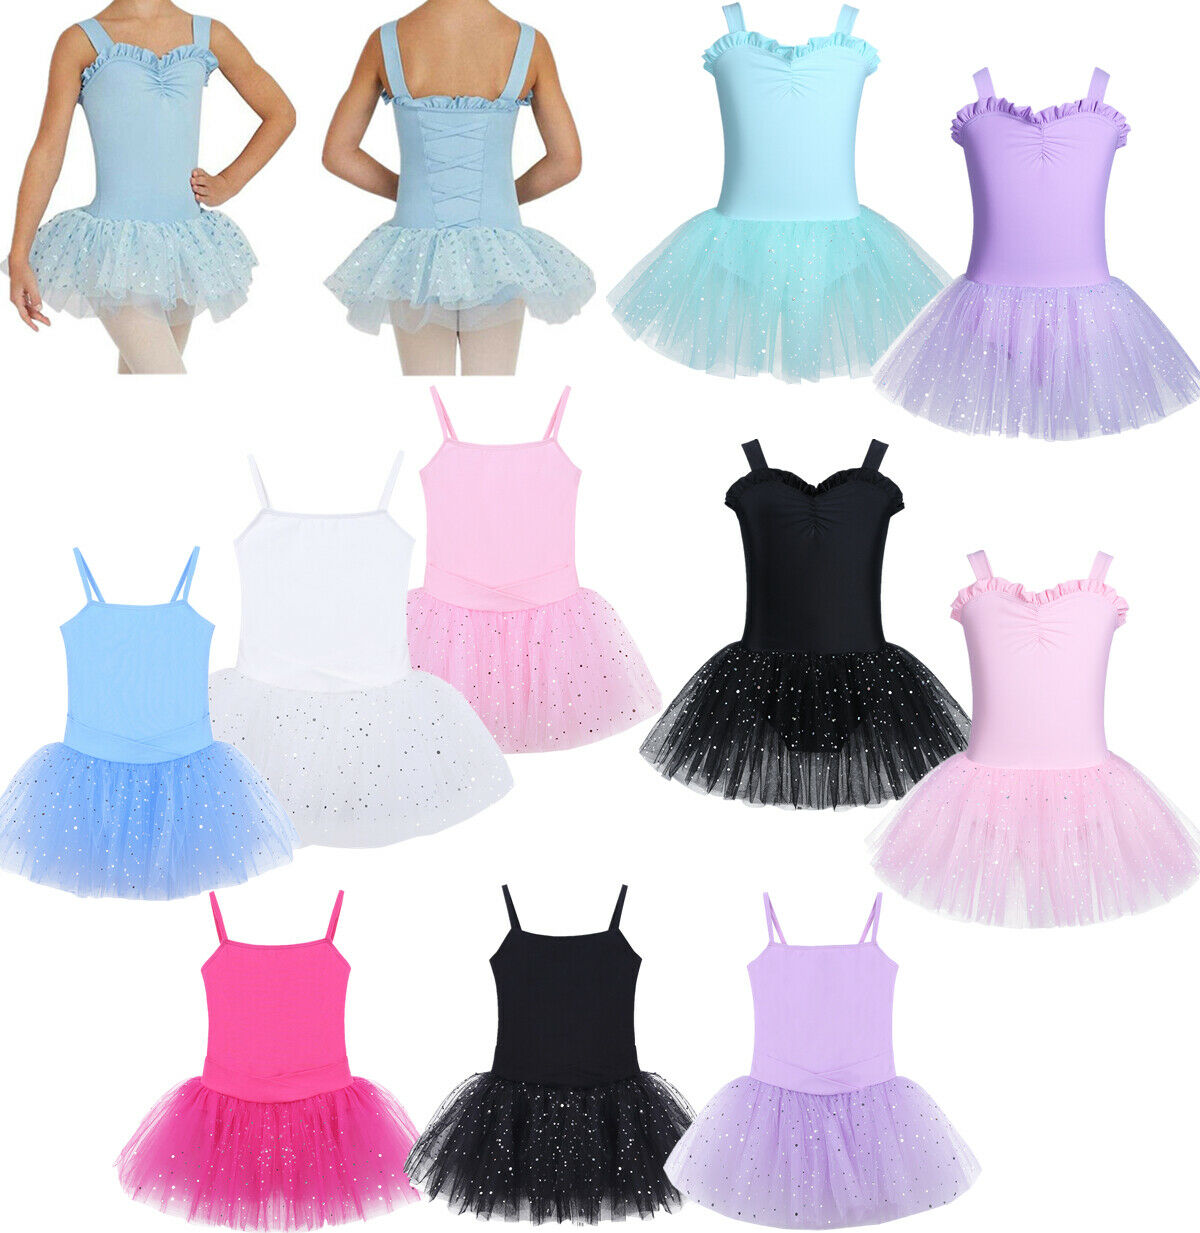 Kids Girls Camisole Ballet Dance Tutu Dress Gymnastics Leotard Skirt Dancewear